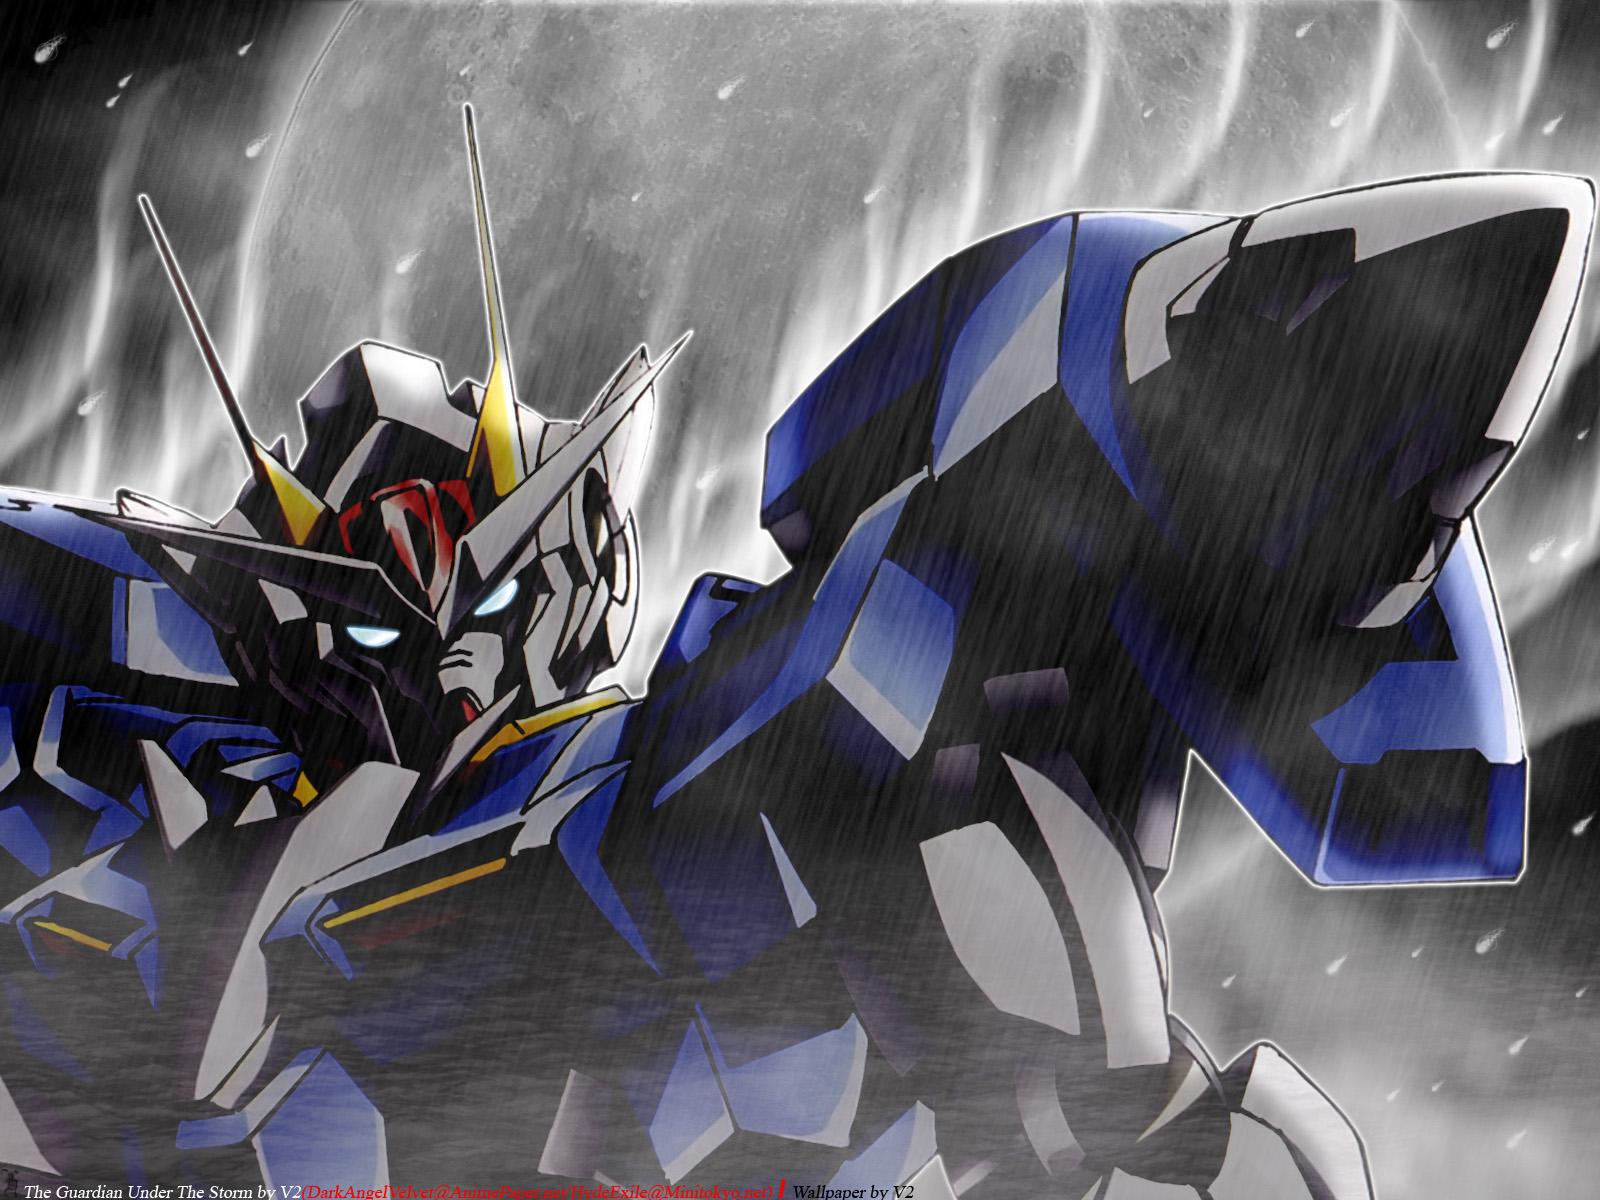 Mobile Suit Gundam 00 Wallpaper: The Guardian Under The ...